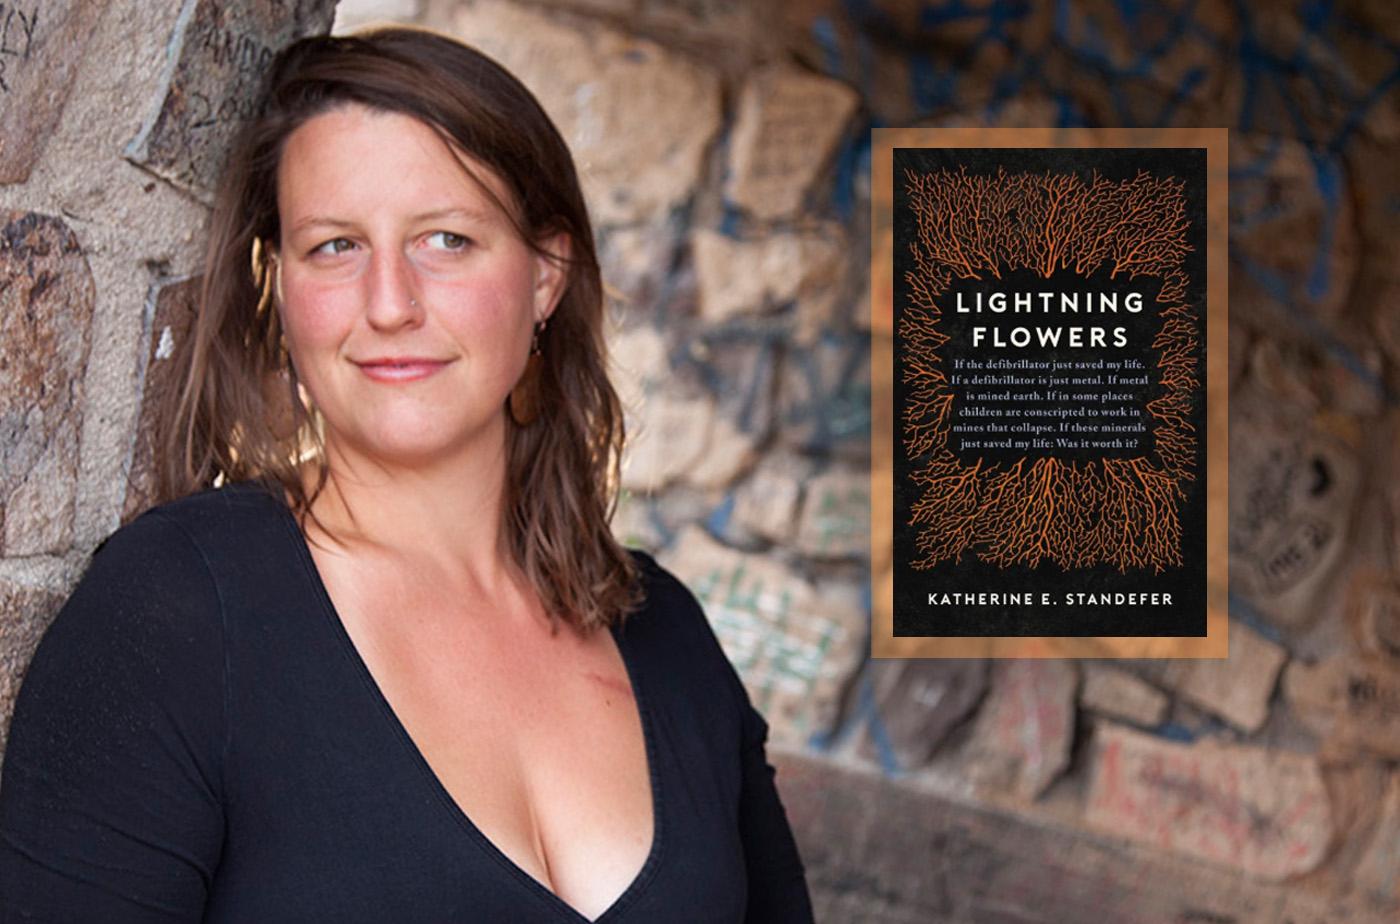 Catapult online classes: Katherine Standefer, 8-Week Online Nonfiction Workshop: Unlocking Tough Stories, Nonfiction, Workshop